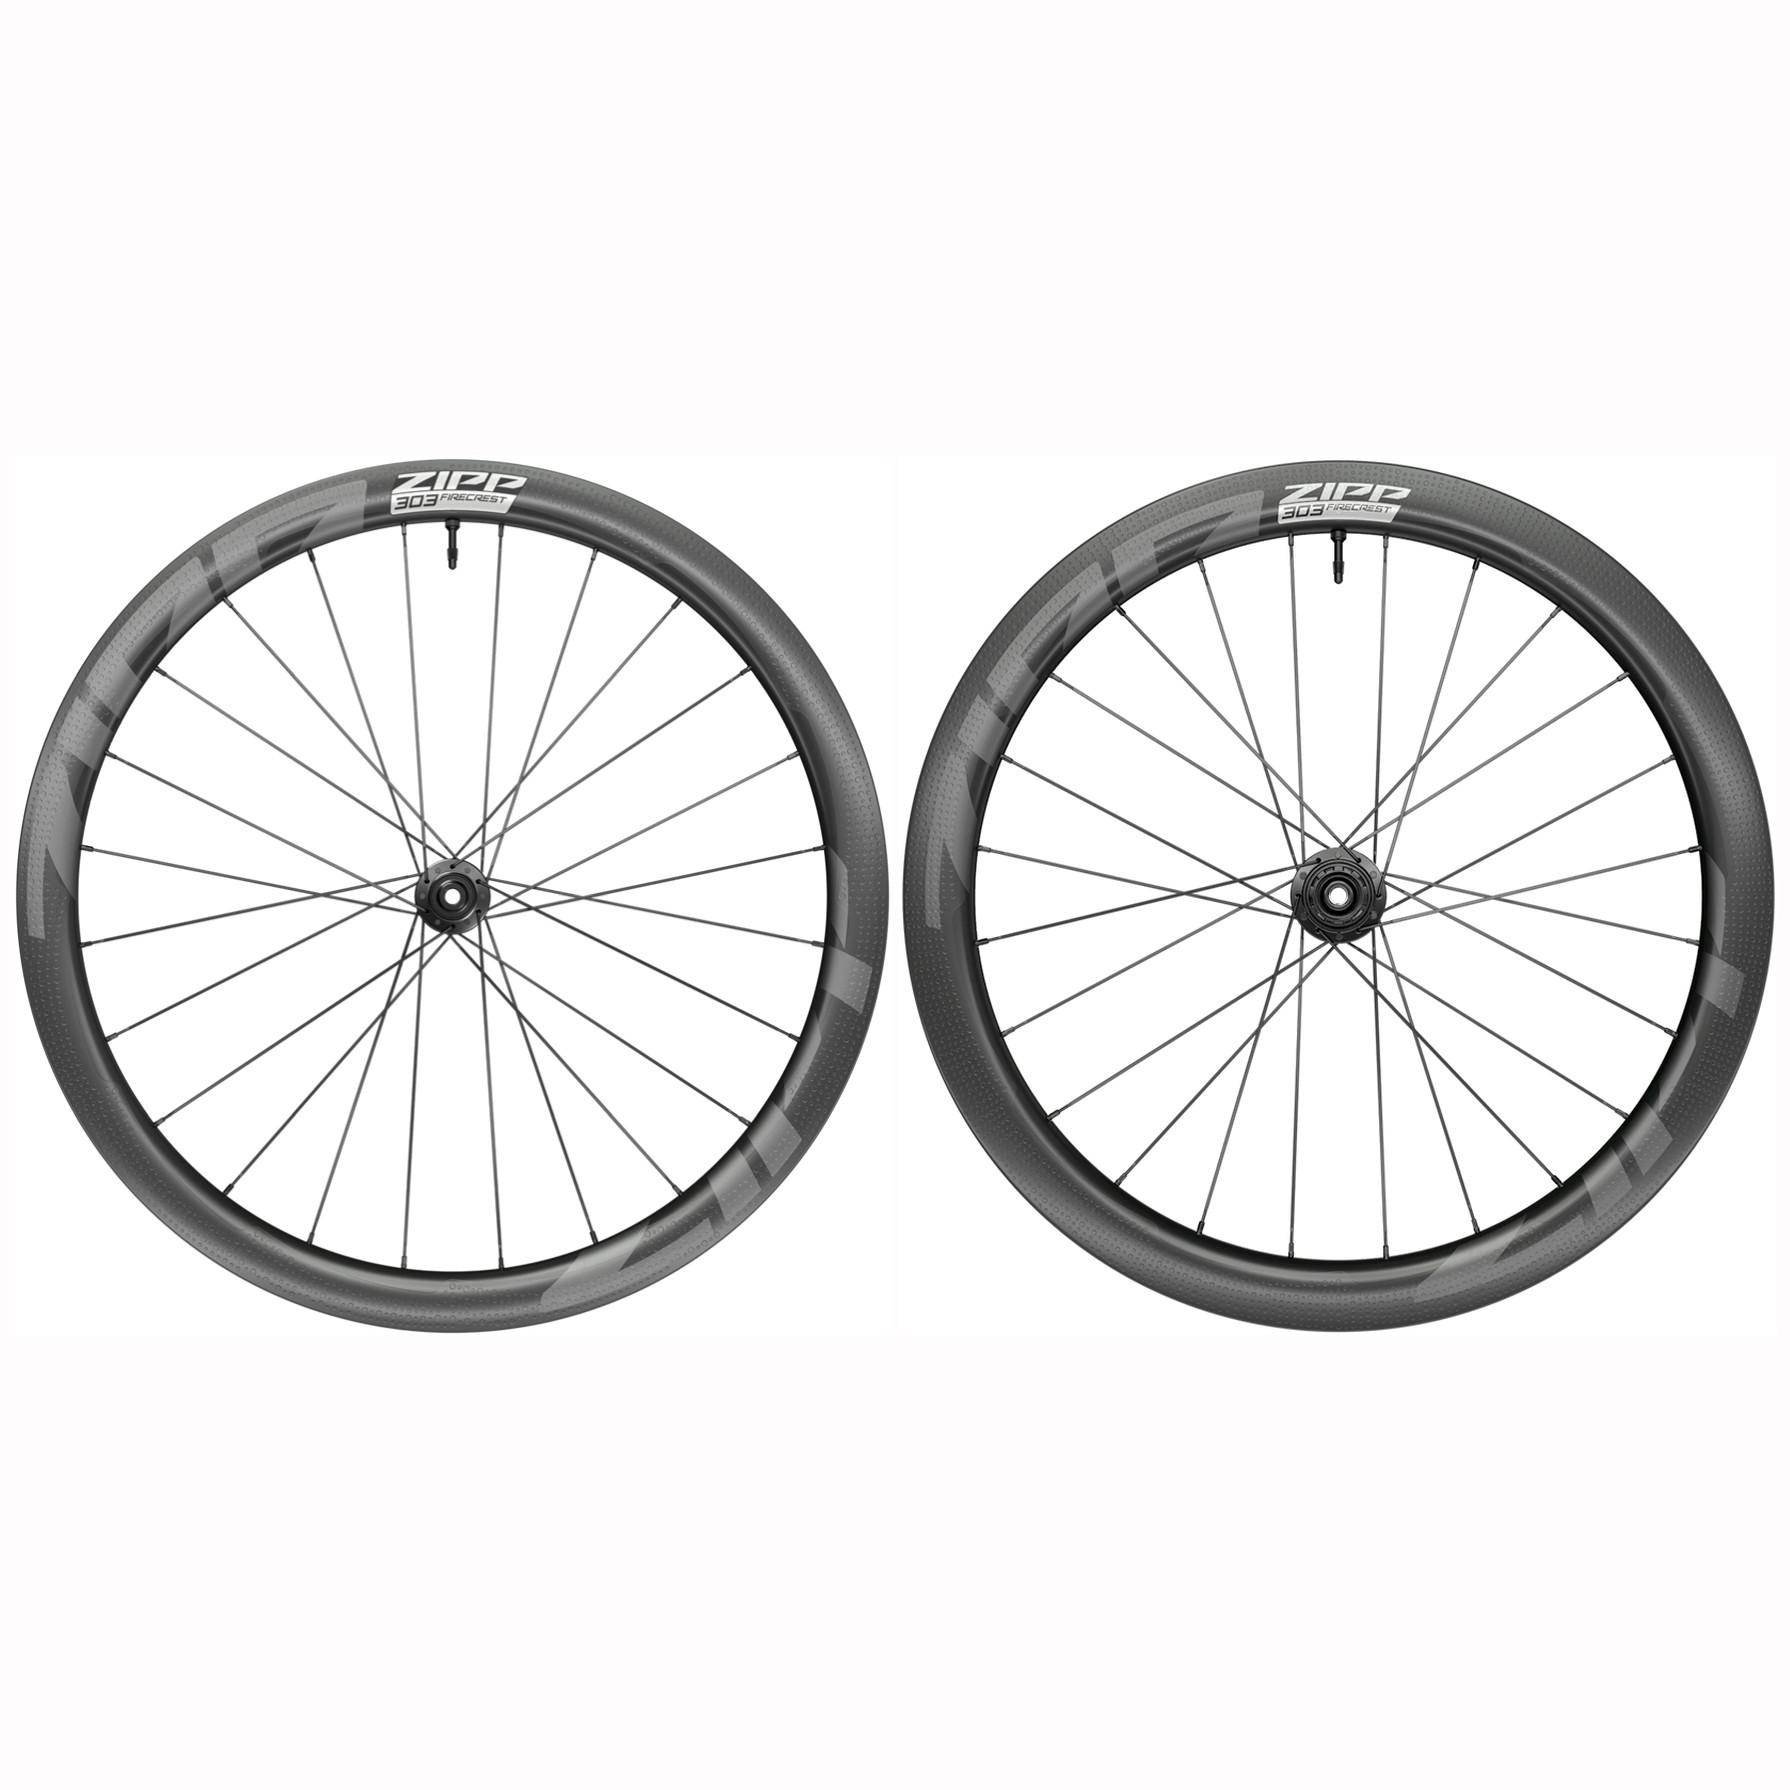 ZIPP 303 Firecrest Carbon Wheelset - Tubeless - Centerlock - FW: 12x100mm   RW: 12x142m - SRAM XDR - black